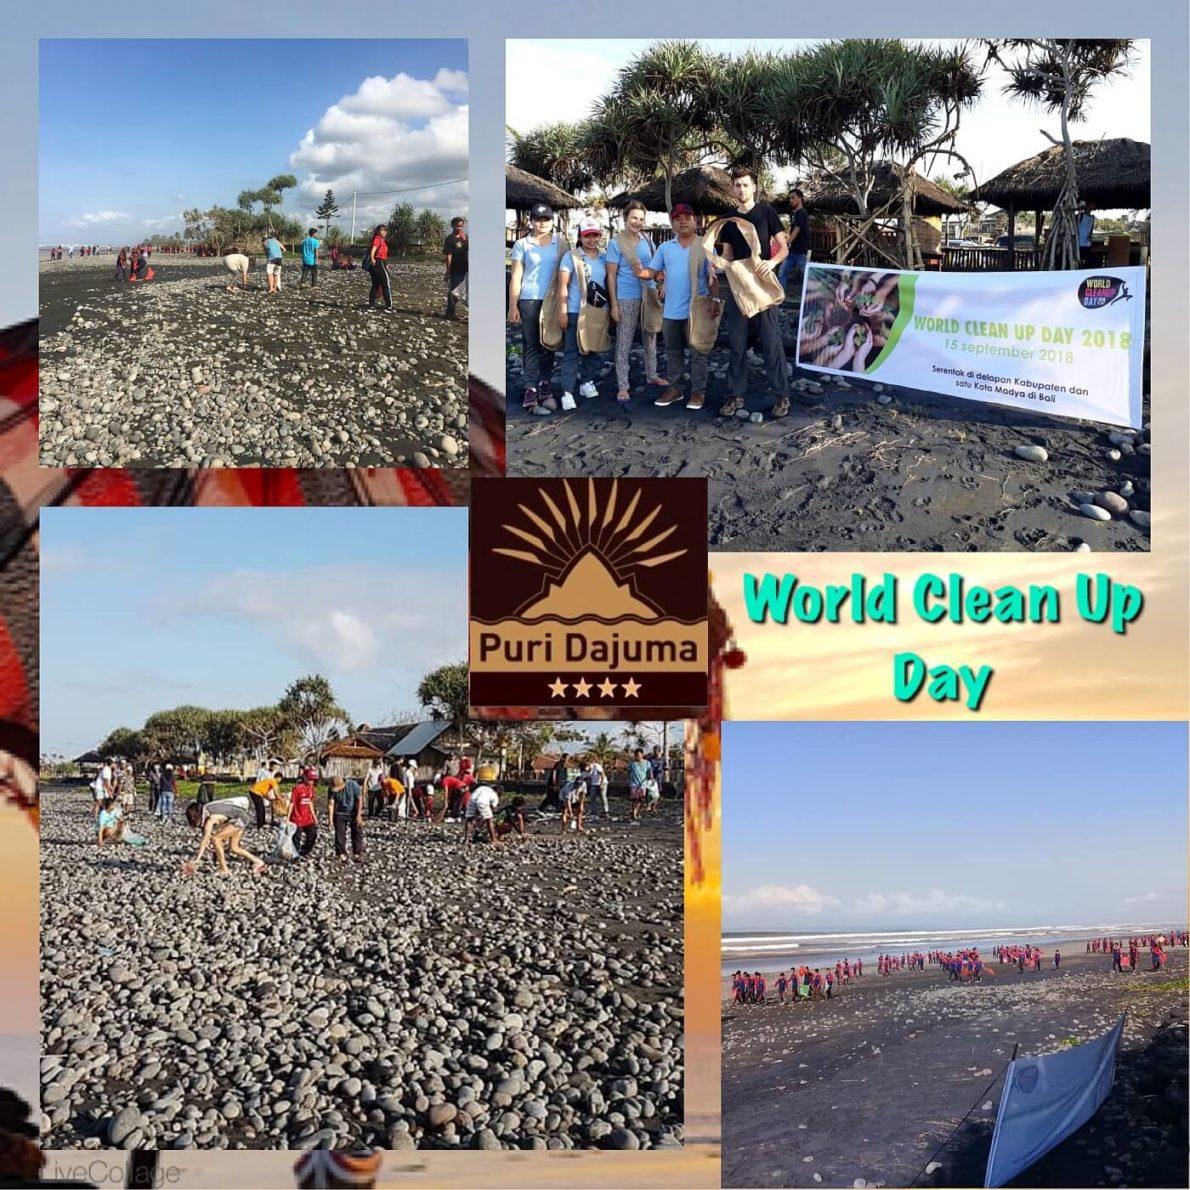 WORLD CLEAN UP DAY Puri Dajuma, Beach Eco-Resort & Spa, West Bali